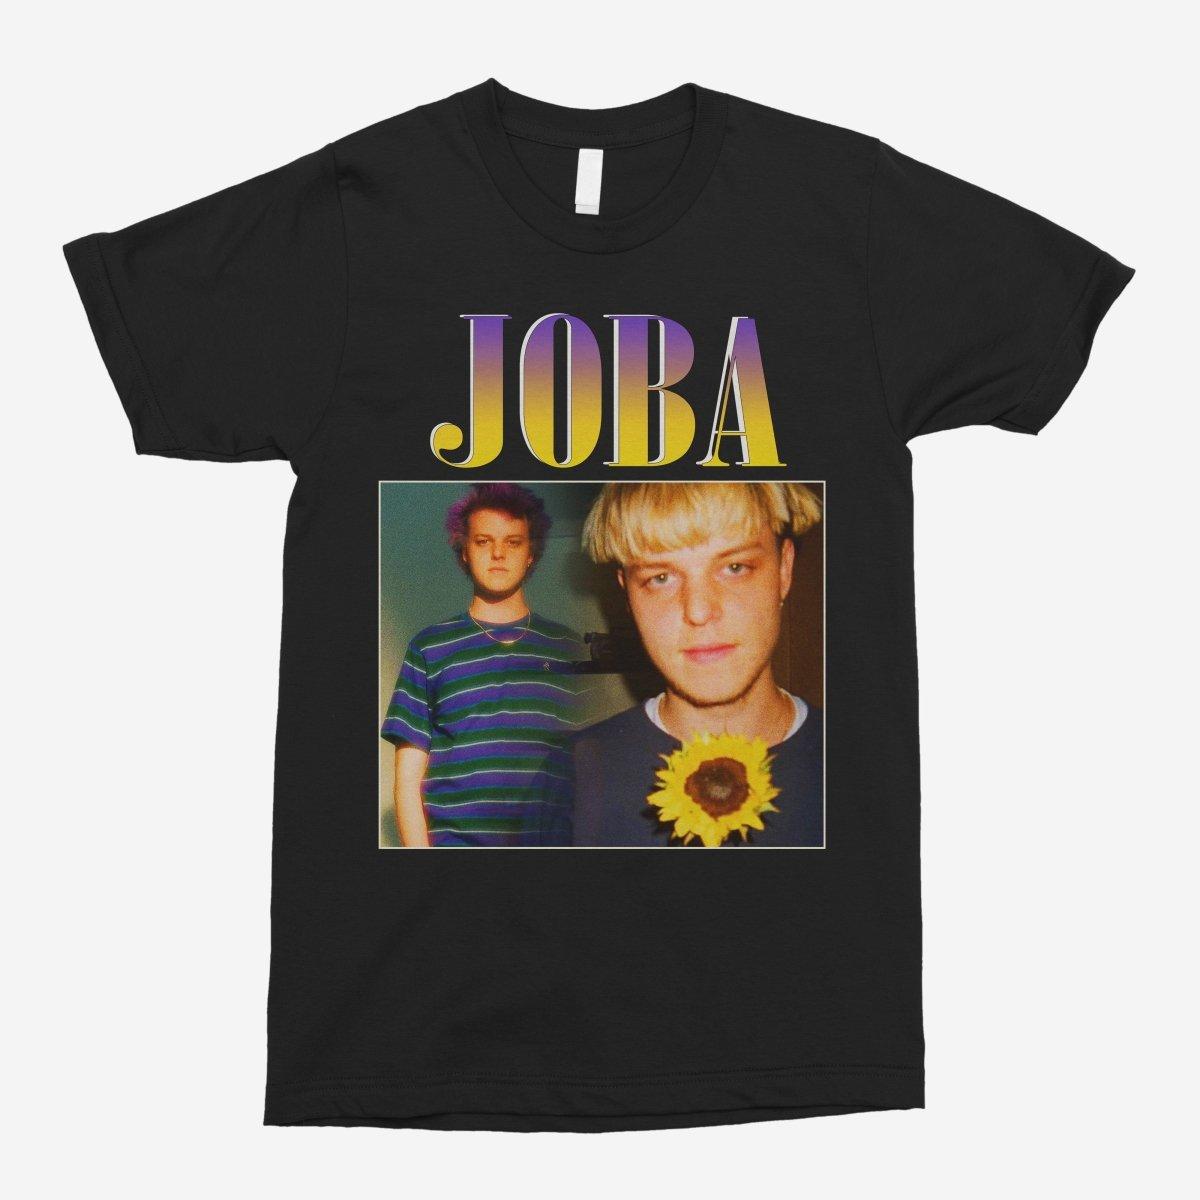 Joba Vintage Unisex T-Shirt